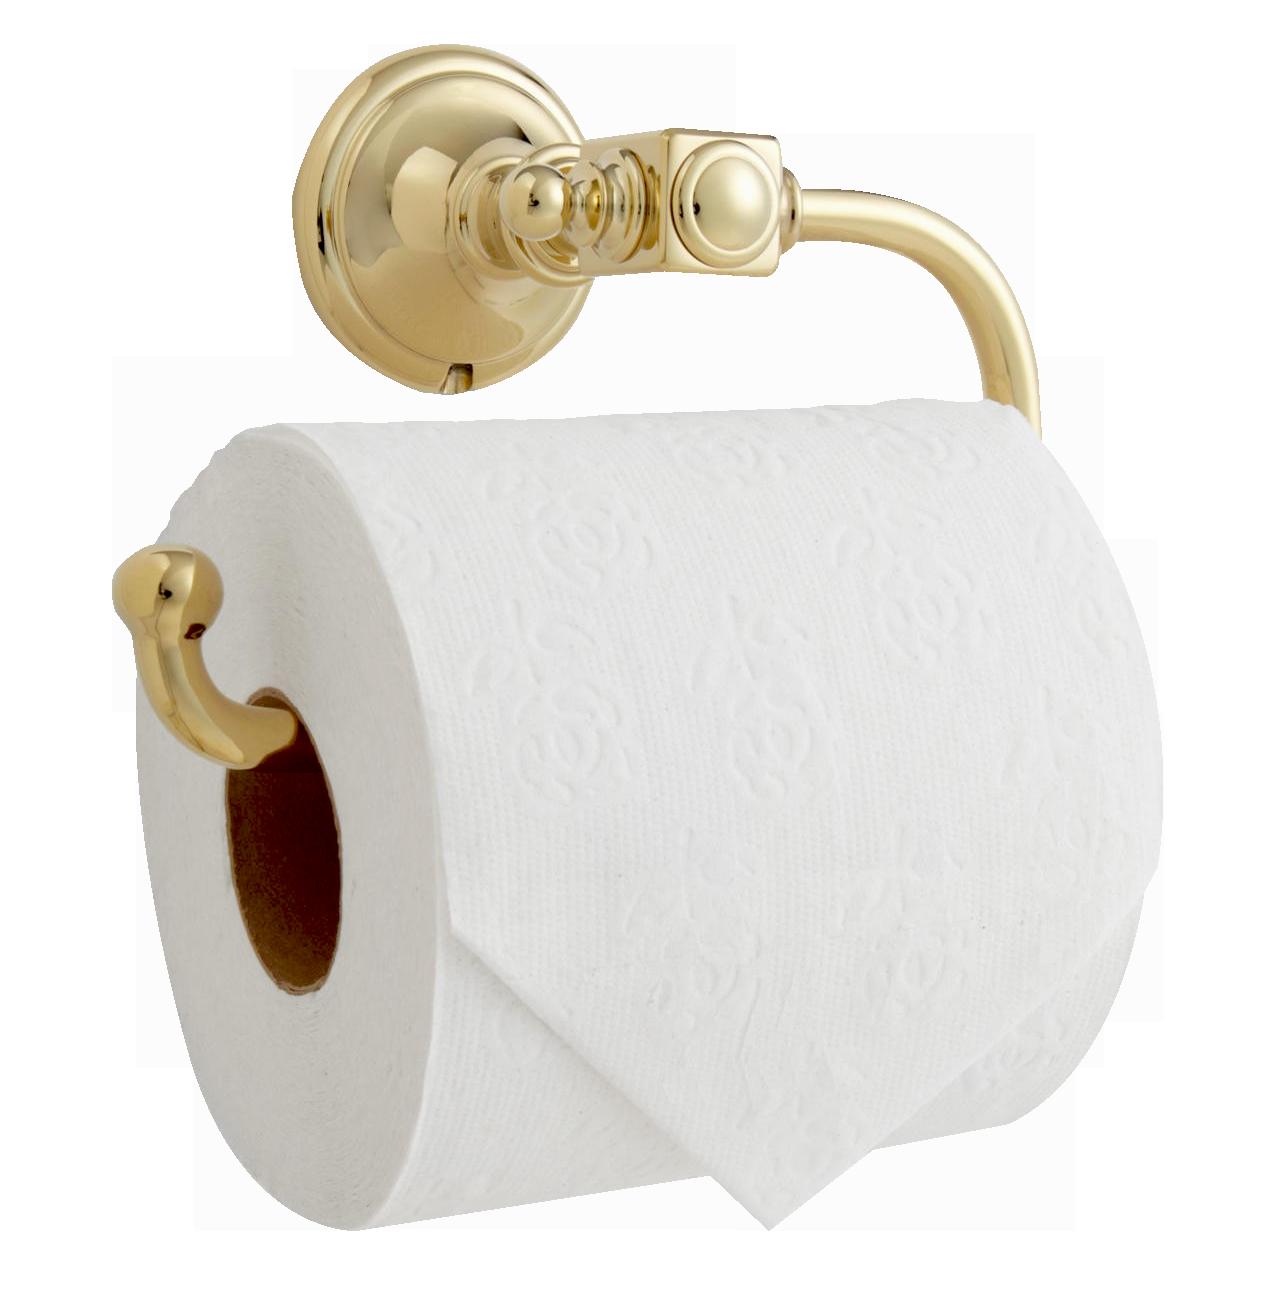 Toilet Paper Png Image Toilet Paper Paper Toilet